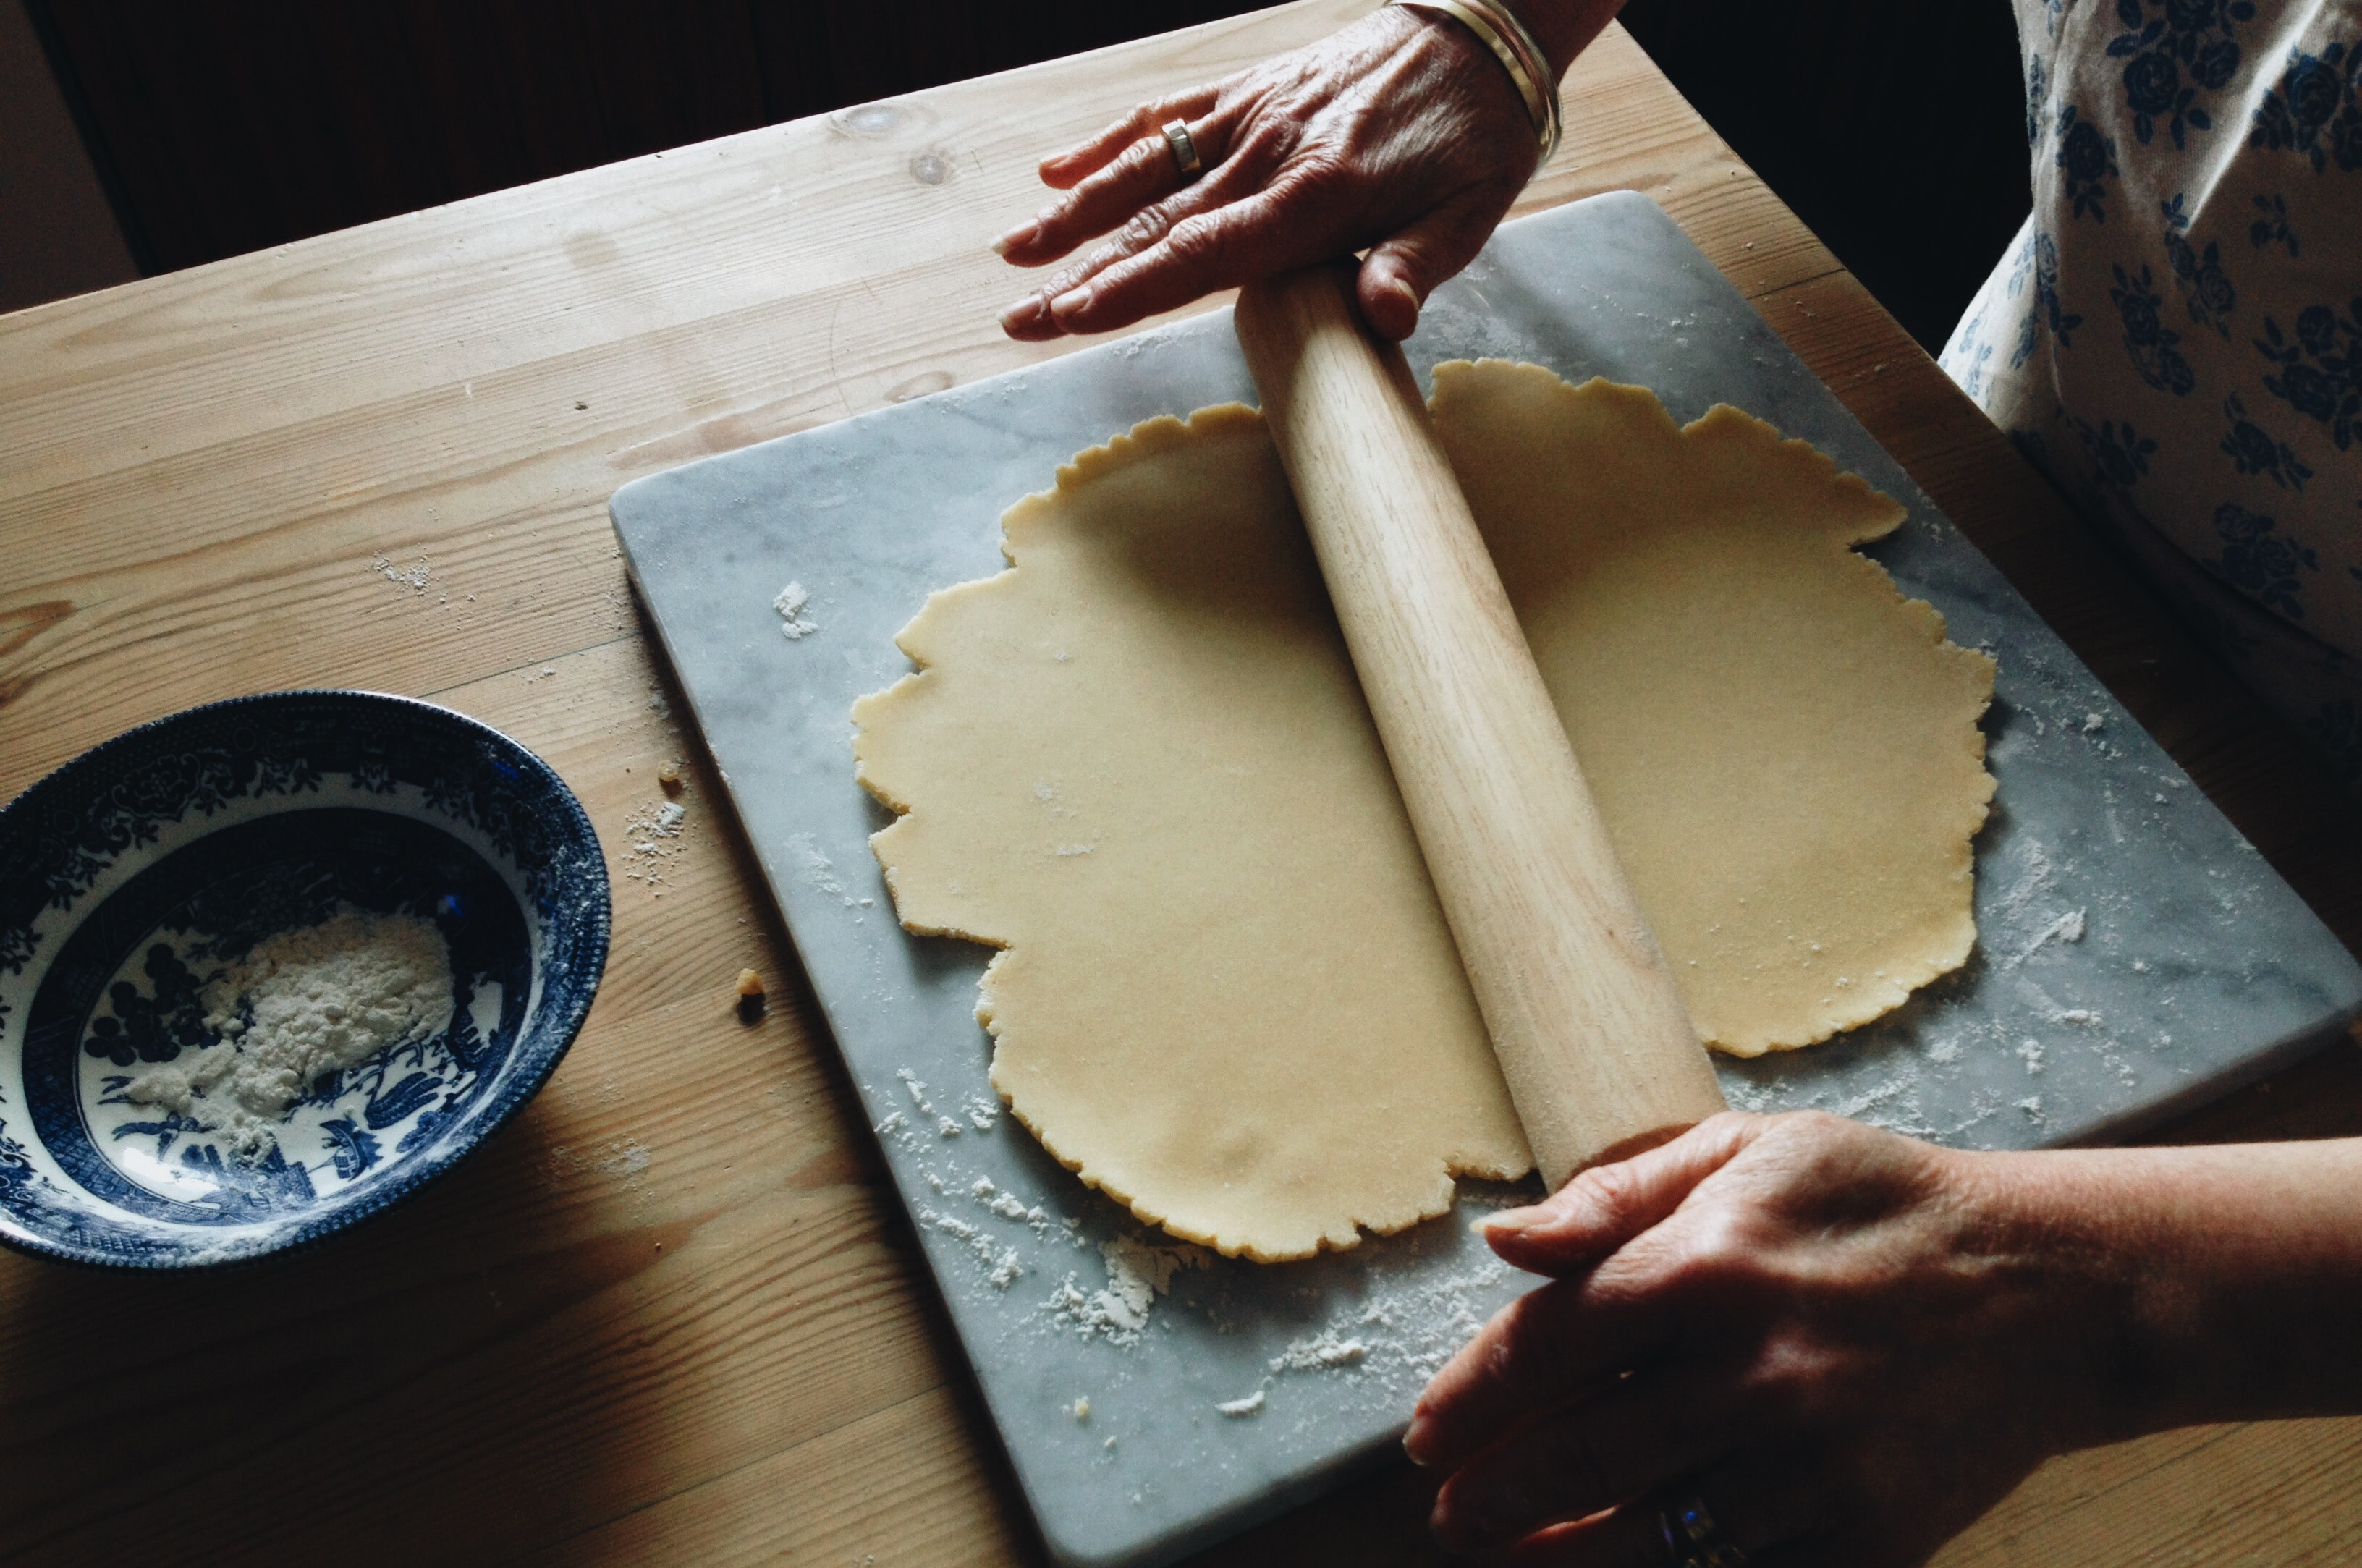 Cuisiner pâte brisée